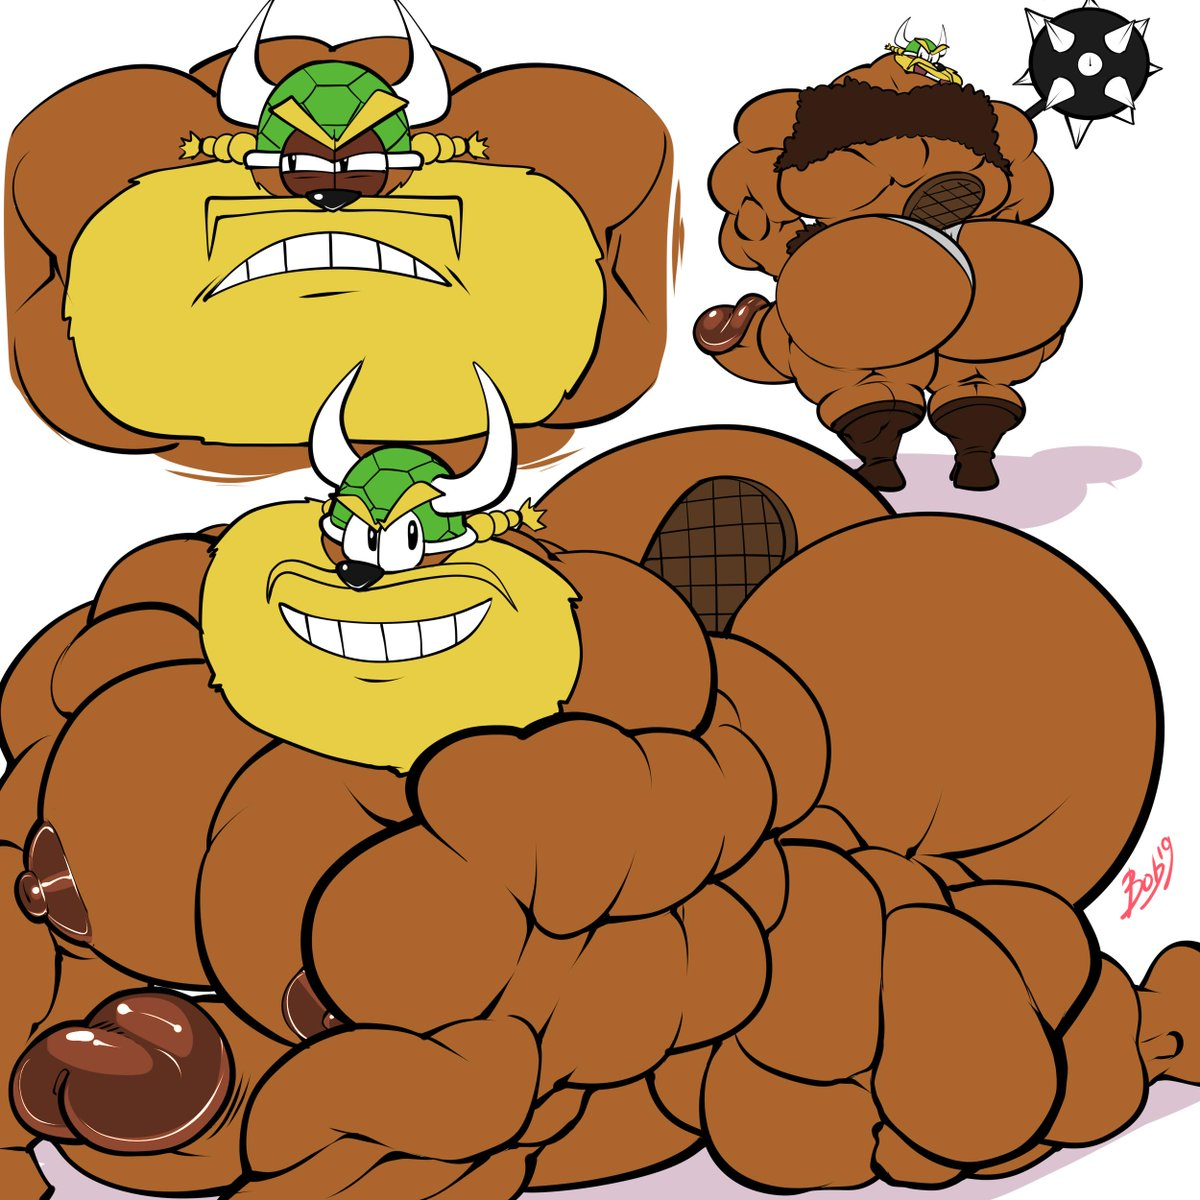 porn big cartoon dick gay This kong has a funny face and he has a coconut gun